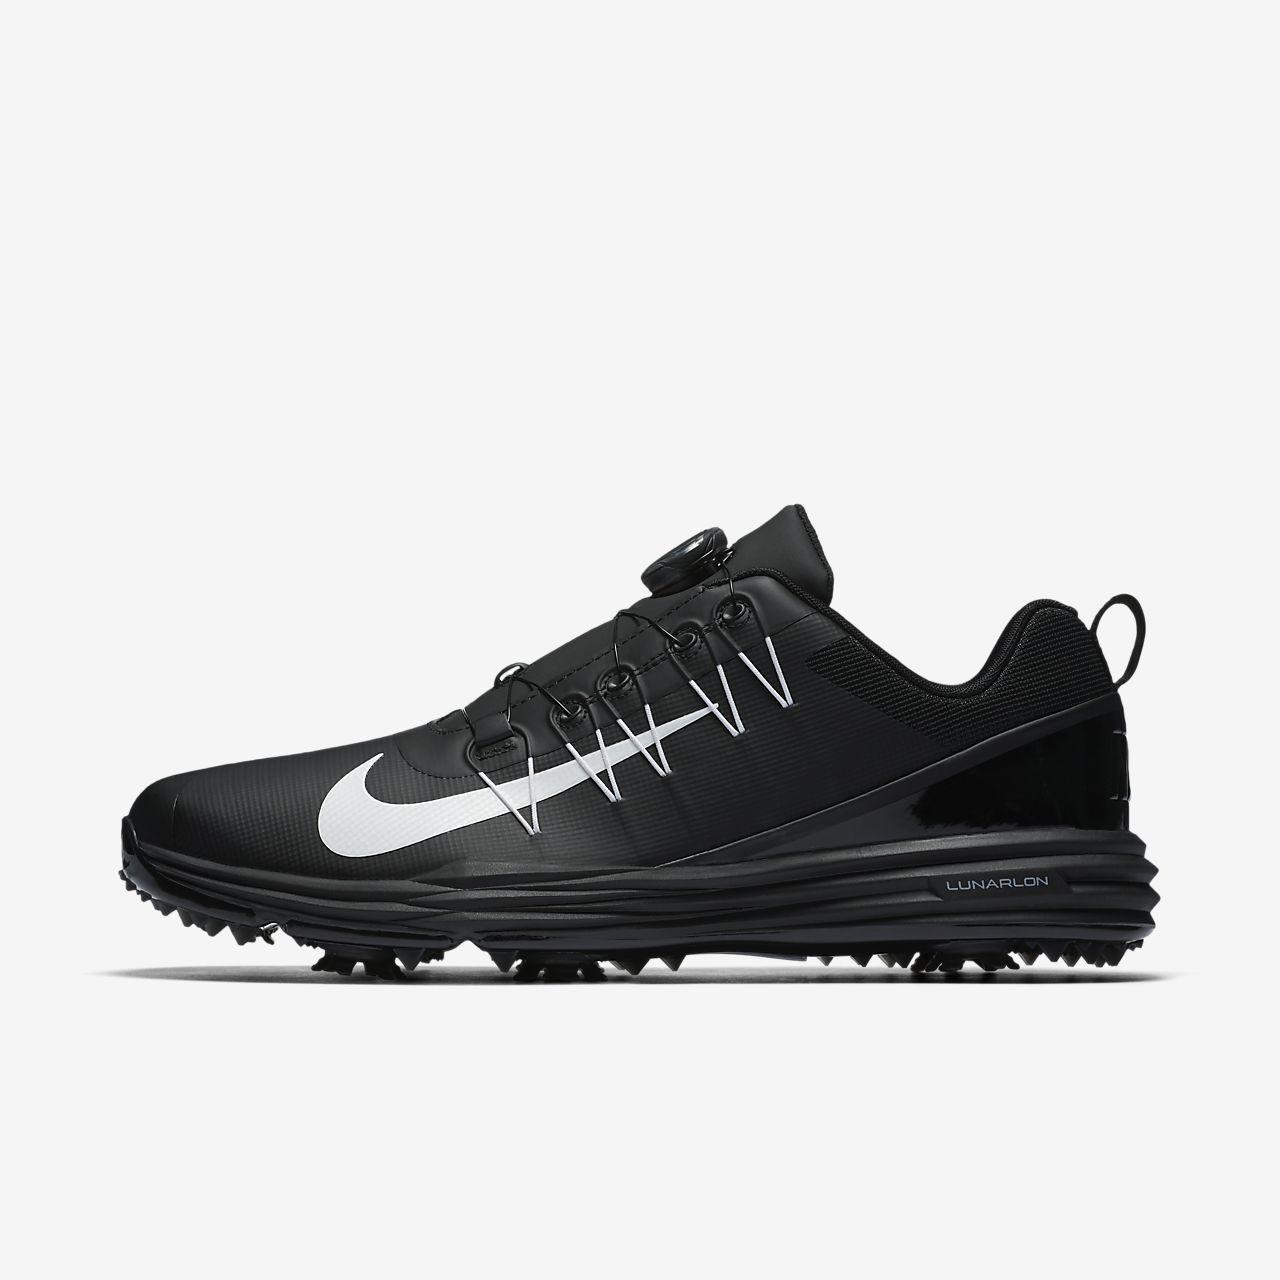 Nike Lunar Command 2 BOA Herren-Golfschuh